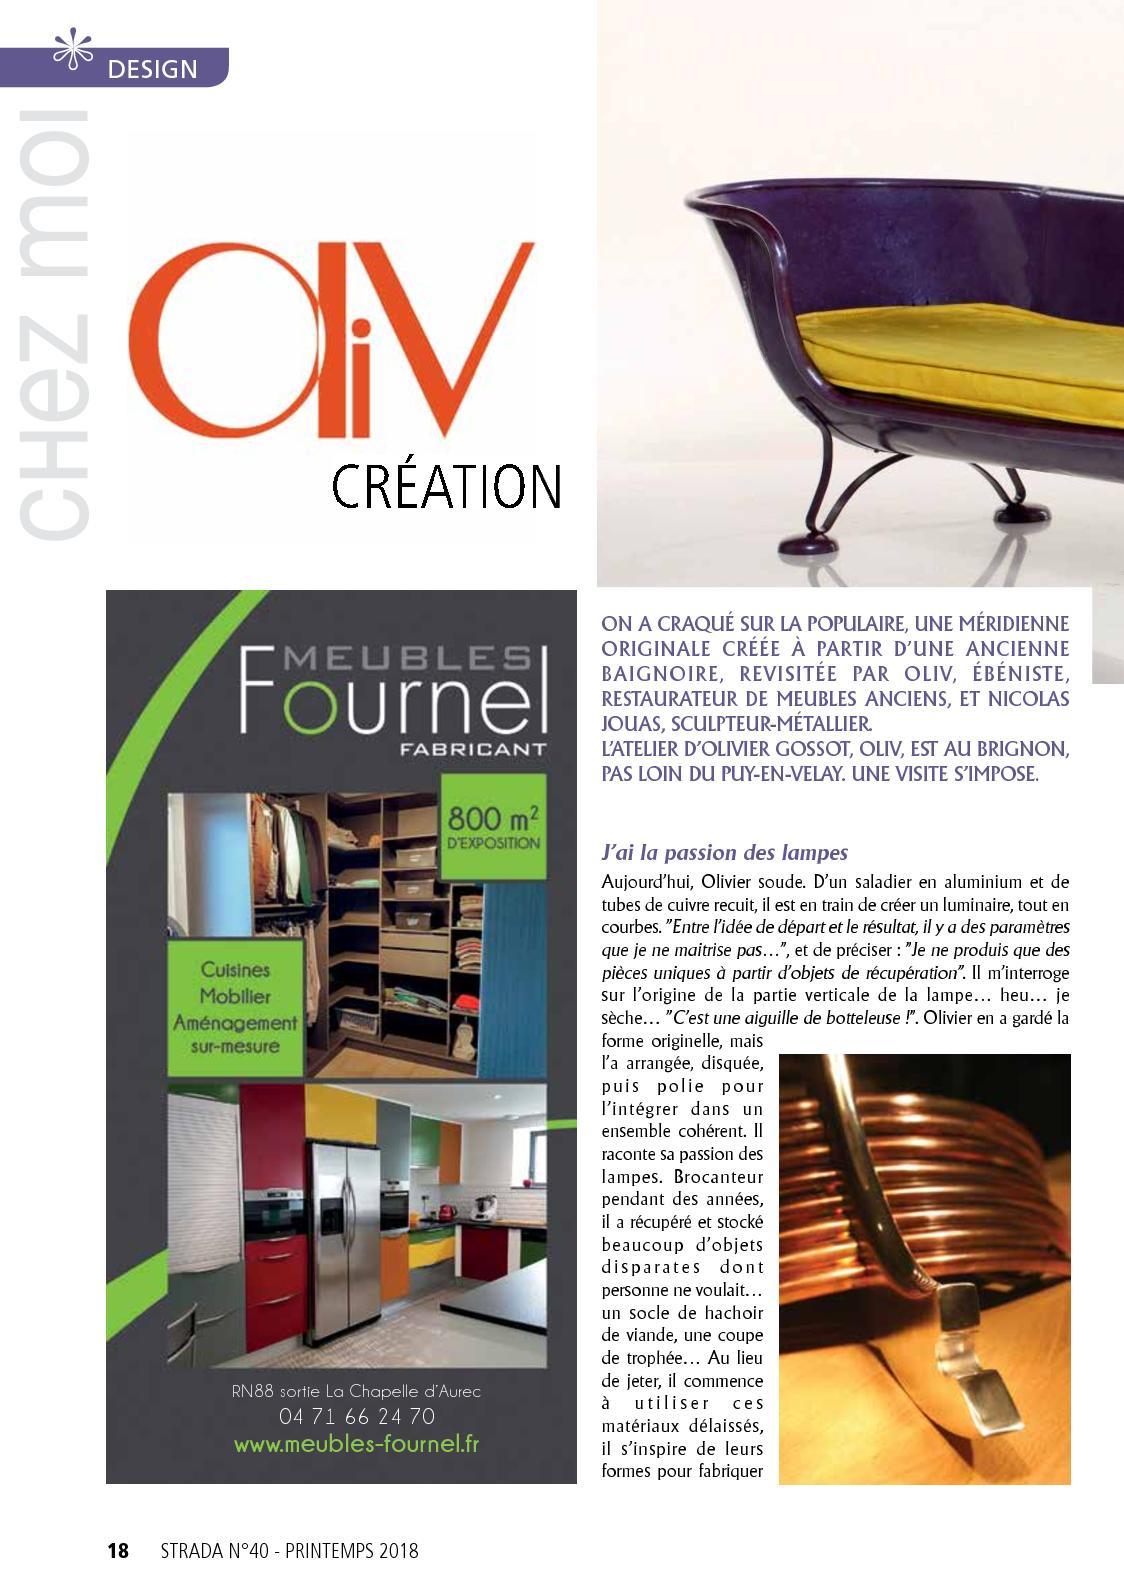 Design Creation Le Puy En Velay strada la vie d'ici n°40 printemps 2018 - calameo downloader